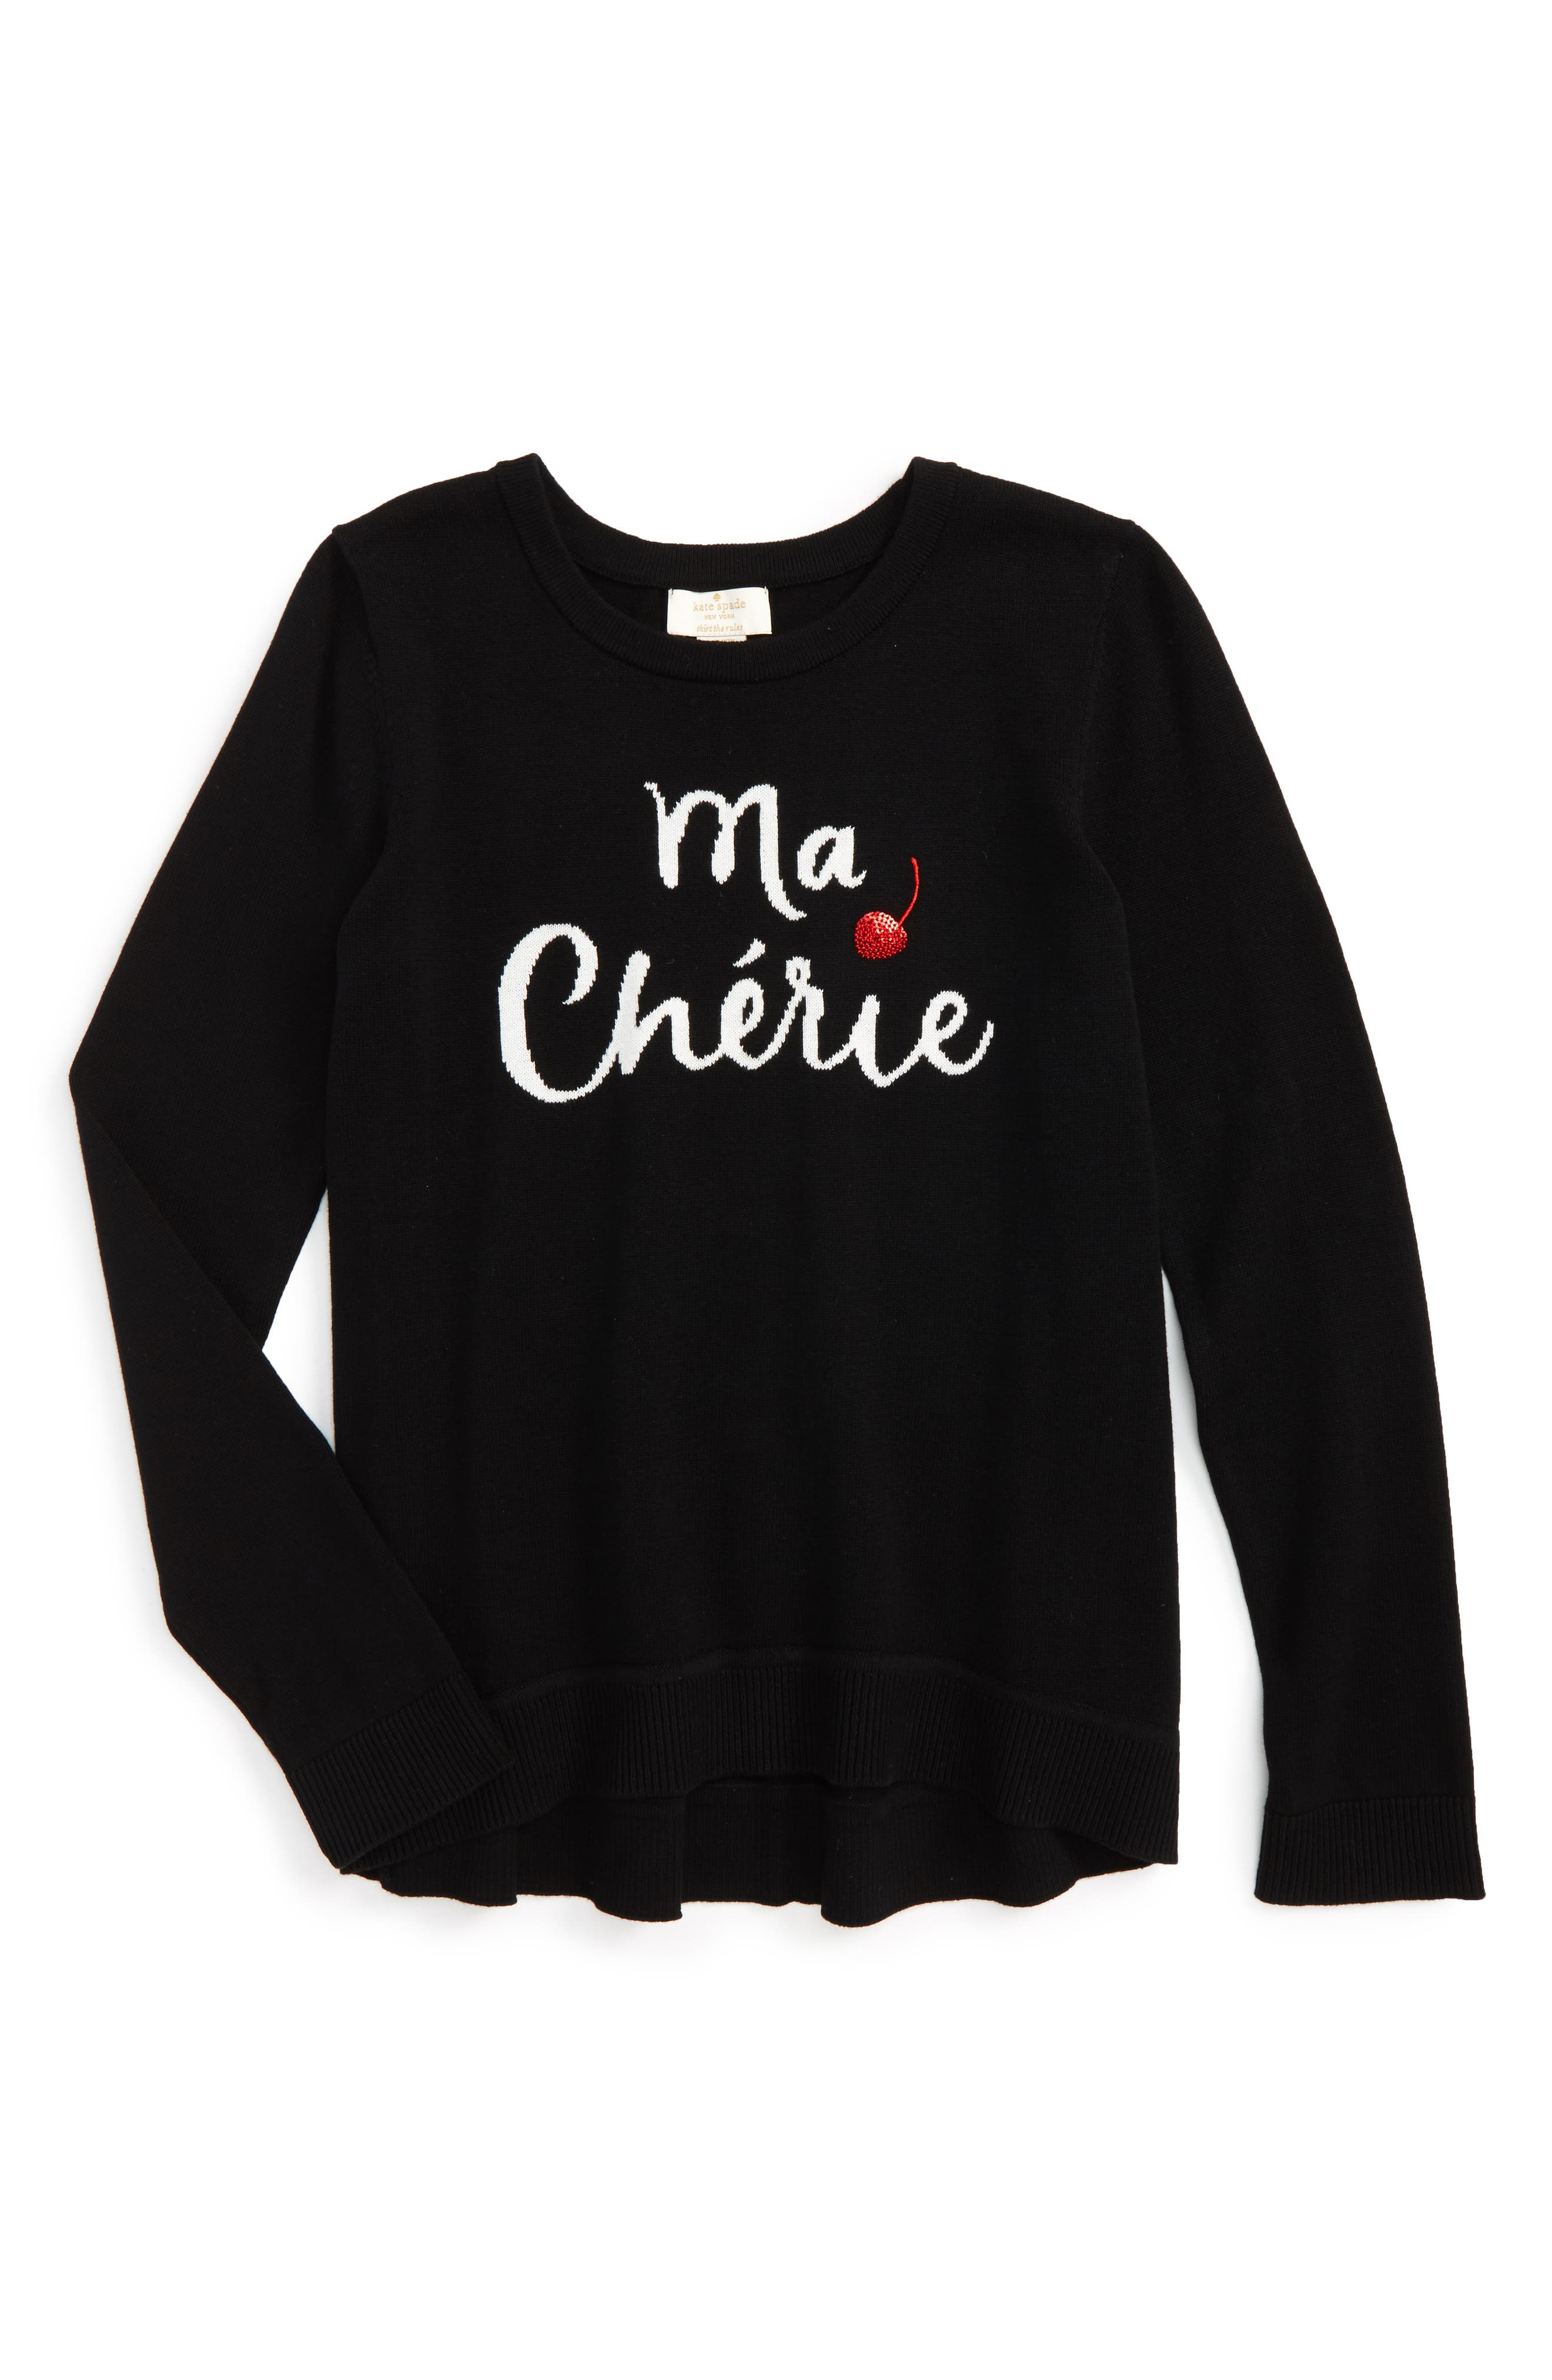 kate spade new york ma cherie intasrsia sweater (Big Girls)